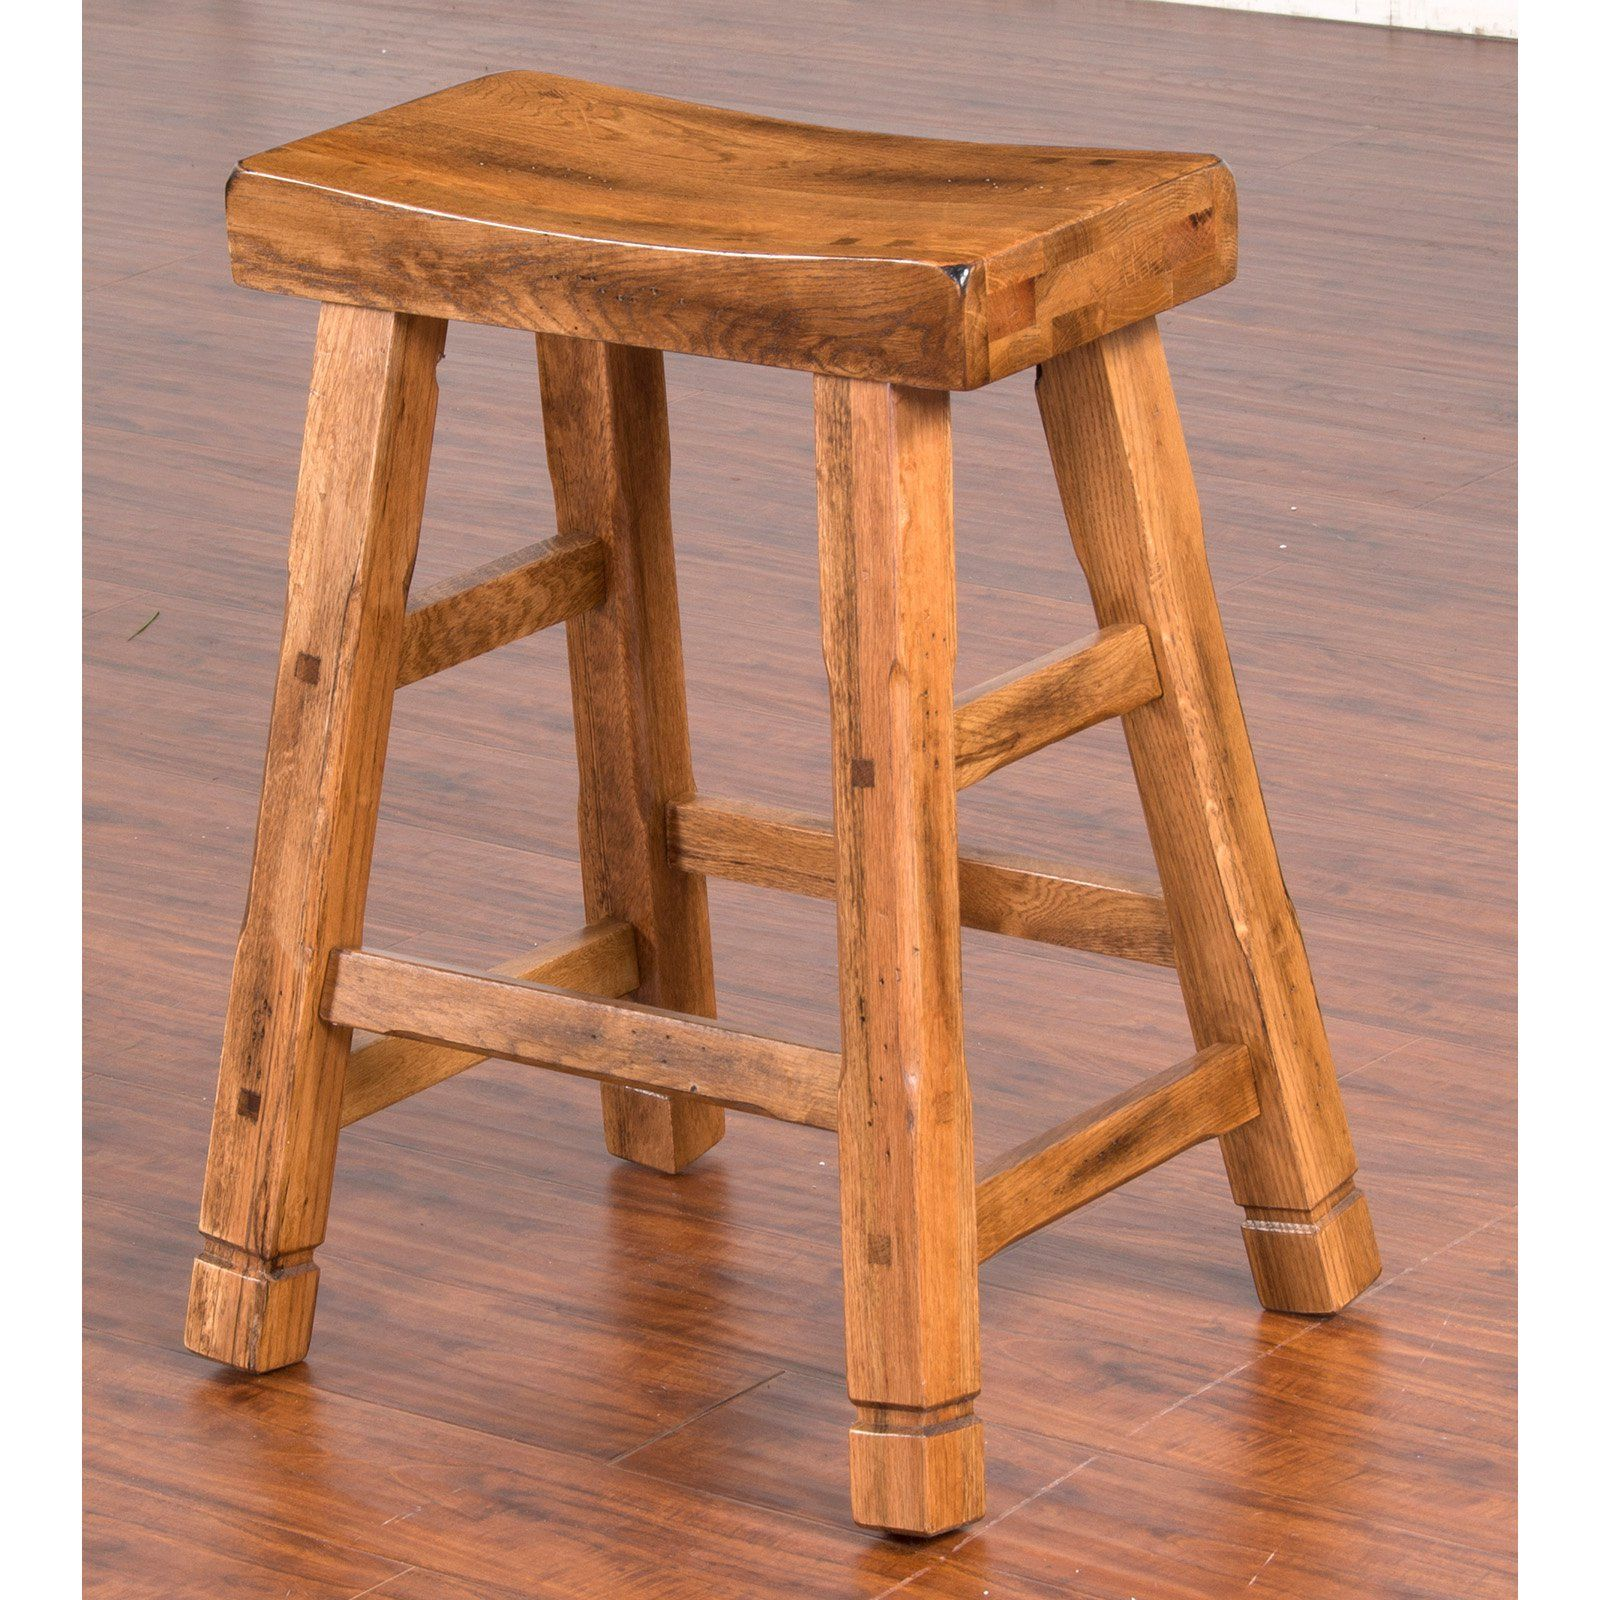 Sunny Designs Sedona 24 In Saddle Seat Counter Stool Saddle Seat Bar Stool Counter Stools